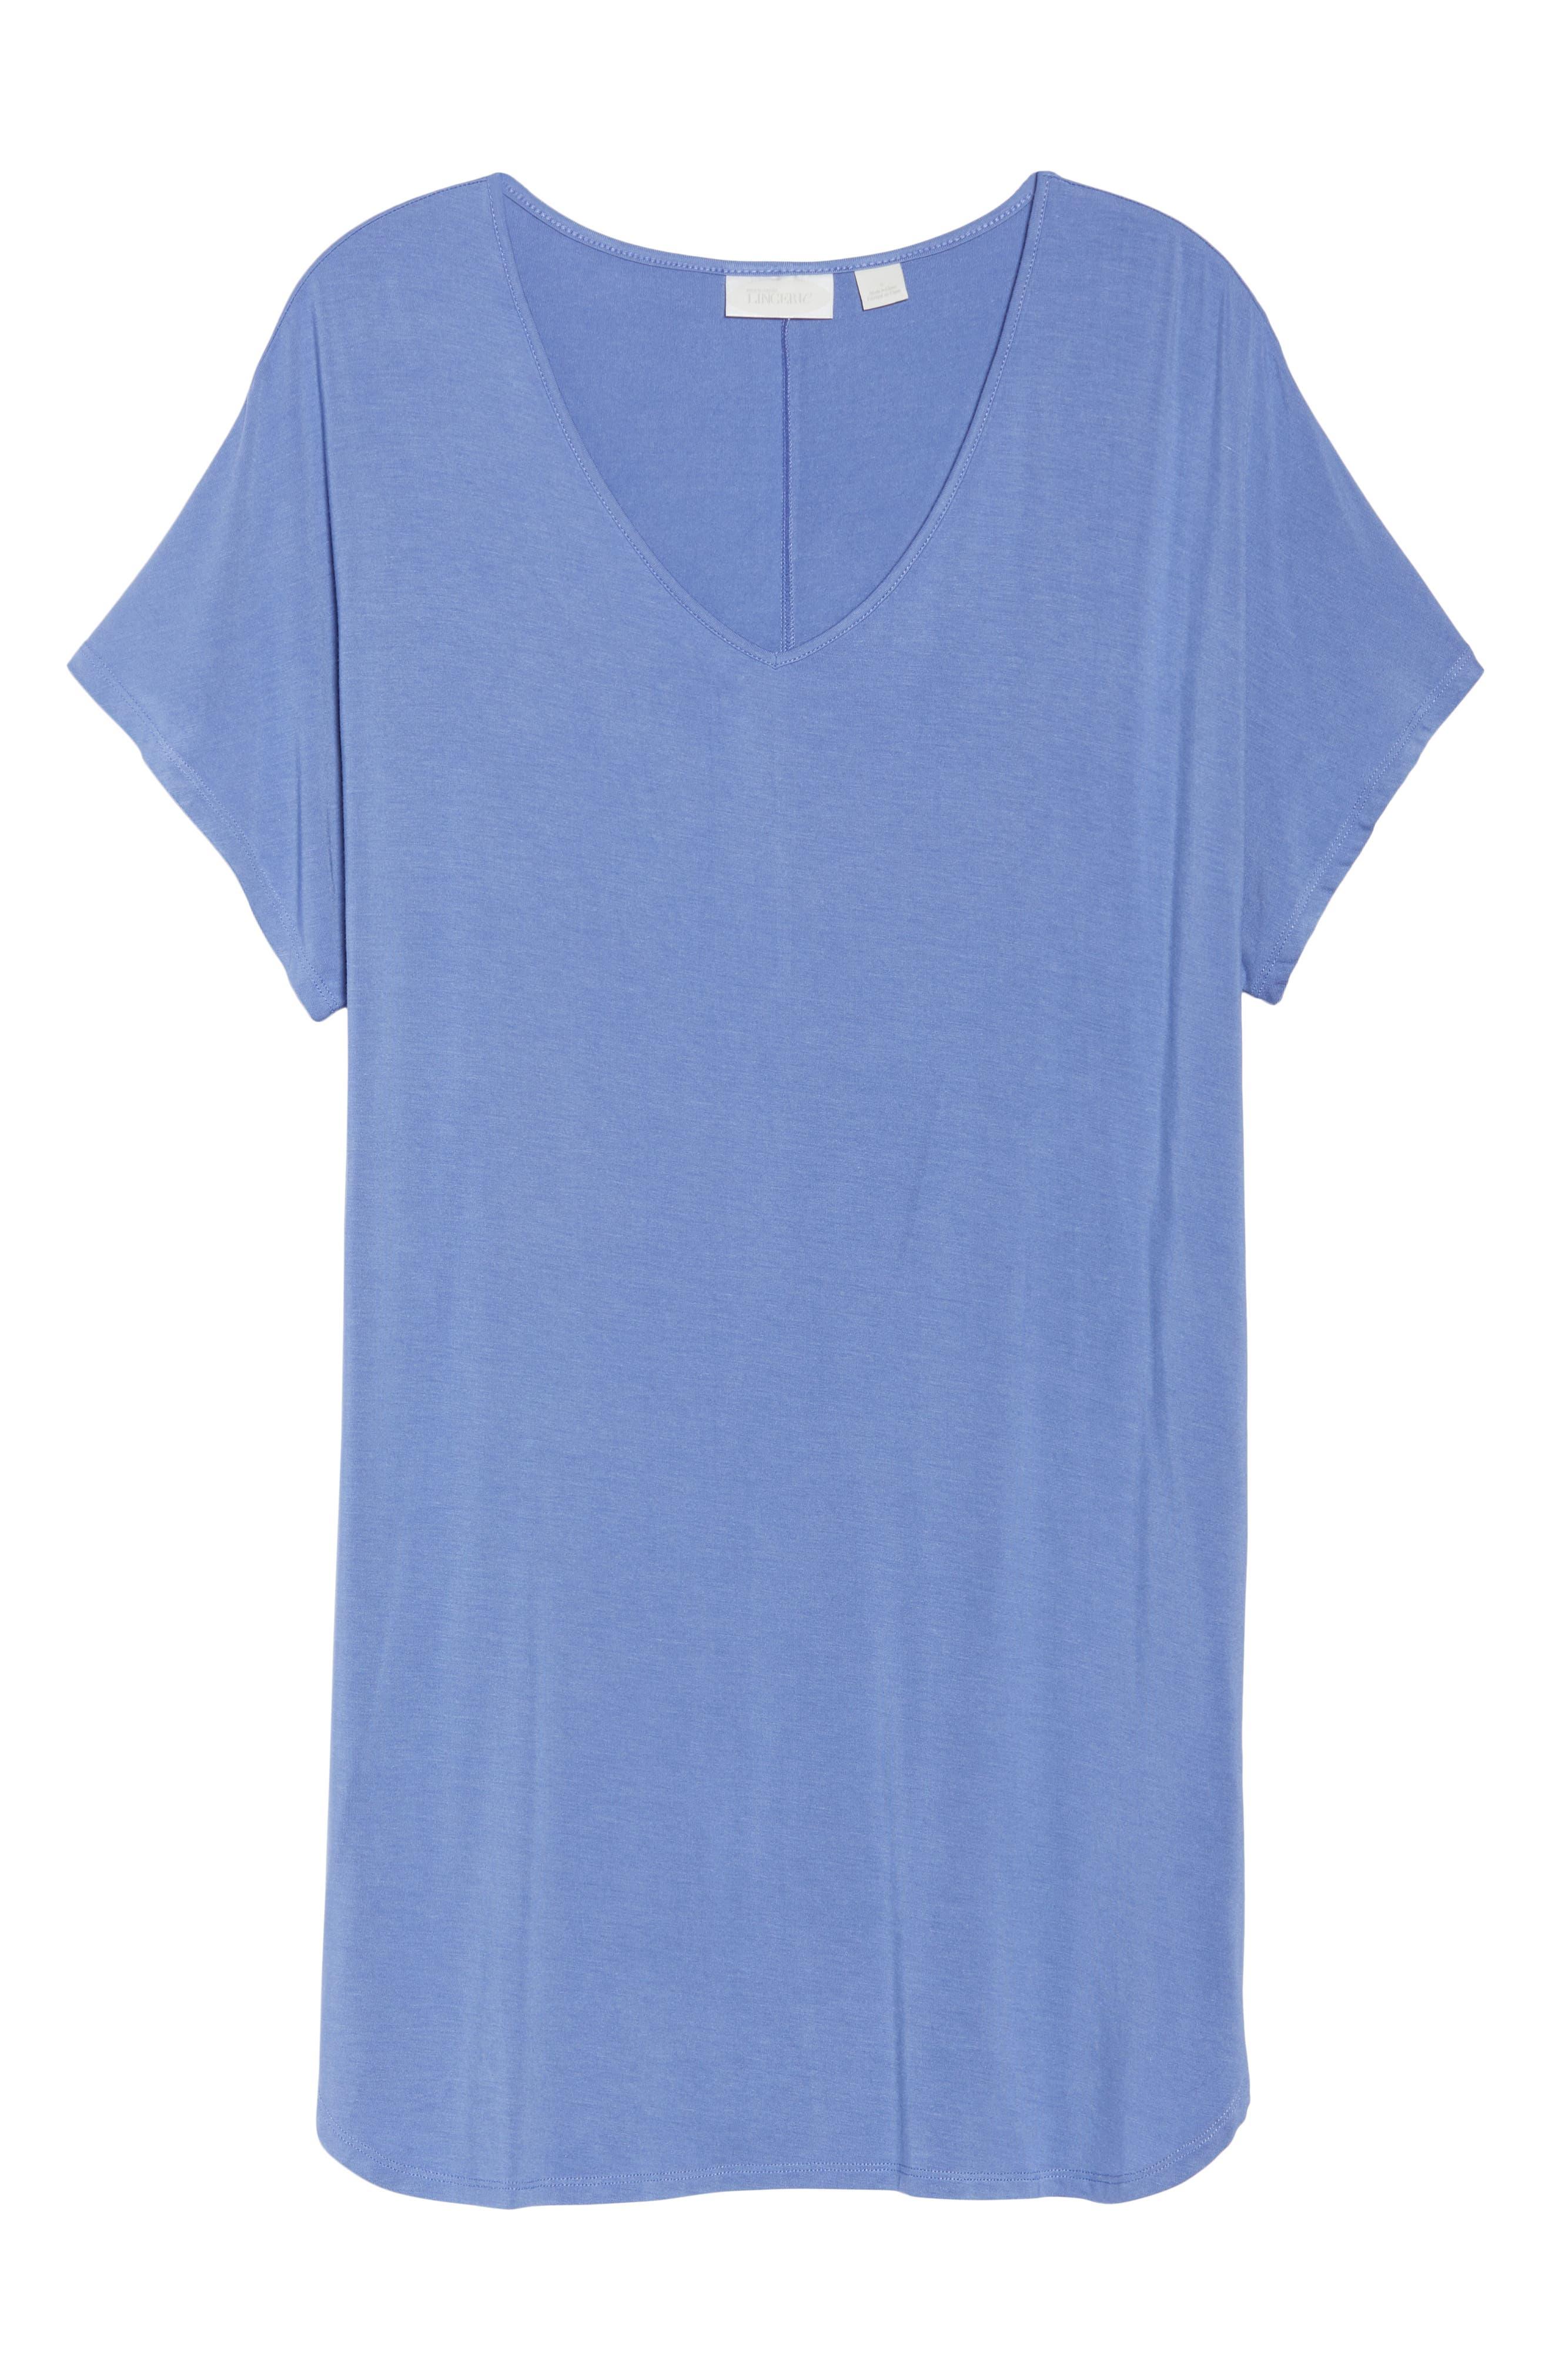 Dolman Sleeve Nightshirt,                             Alternate thumbnail 6, color,                             Blue Denim